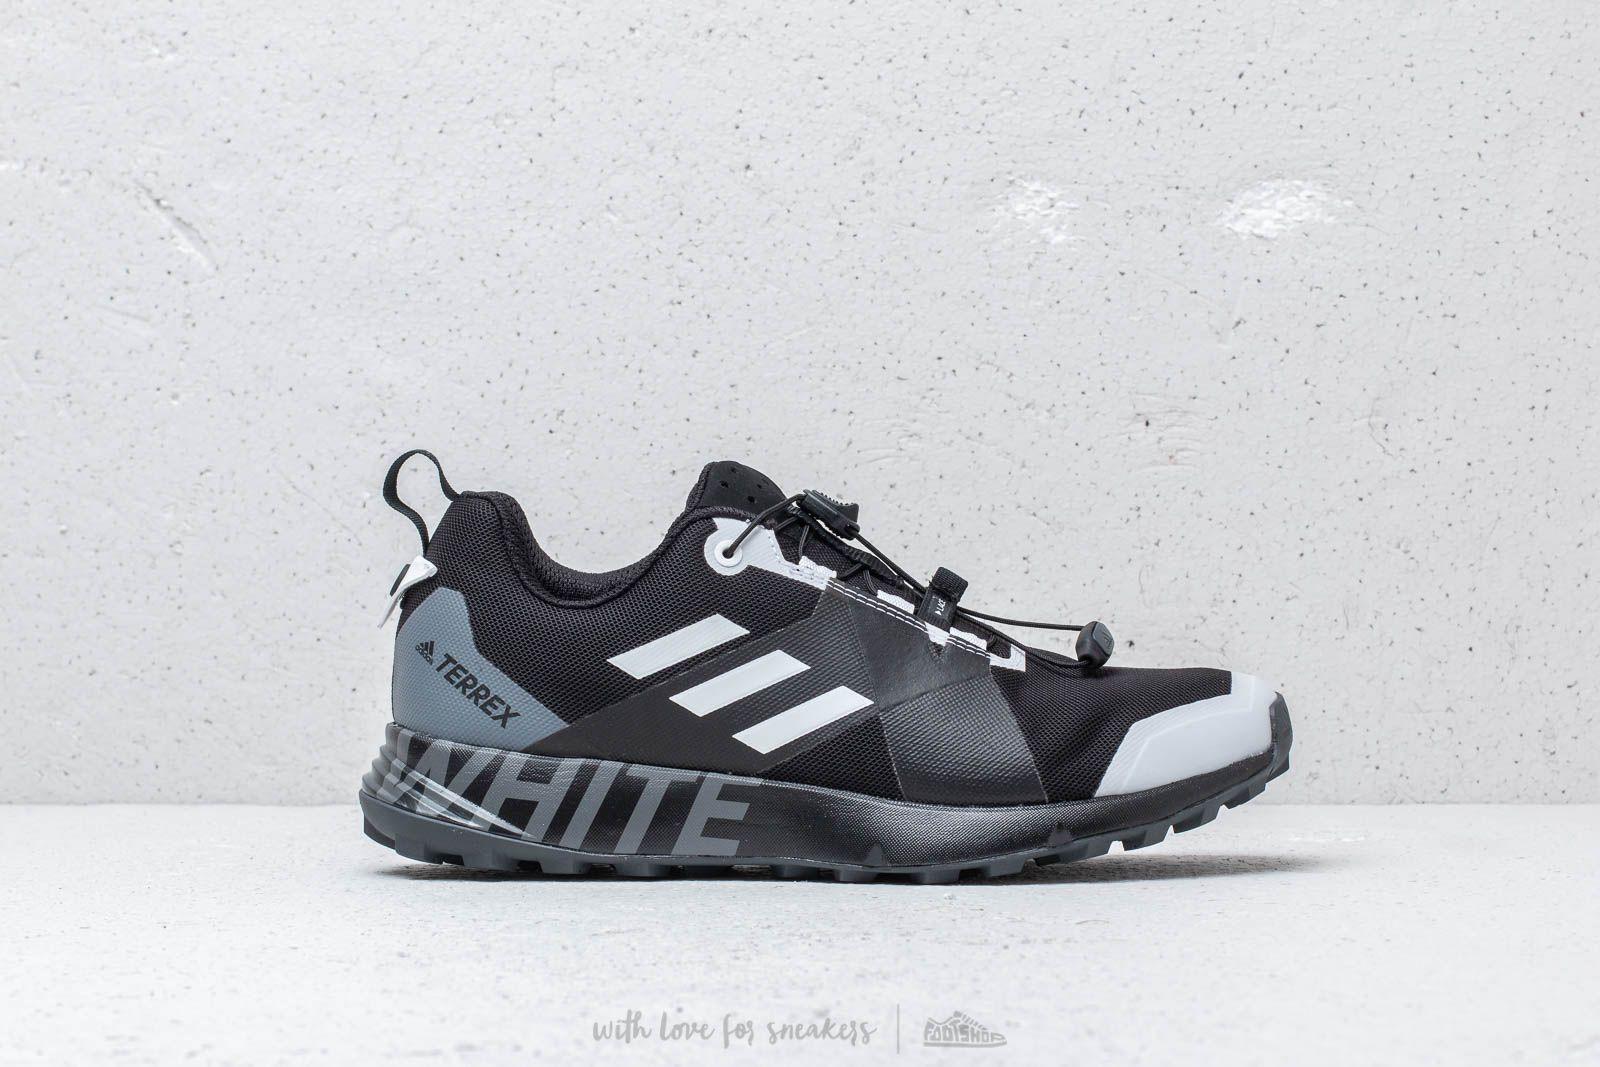 90c6ef493 Adidas x White Mountaineering Terrex Two GTX Carbon  Core Black  Footwear  White at a